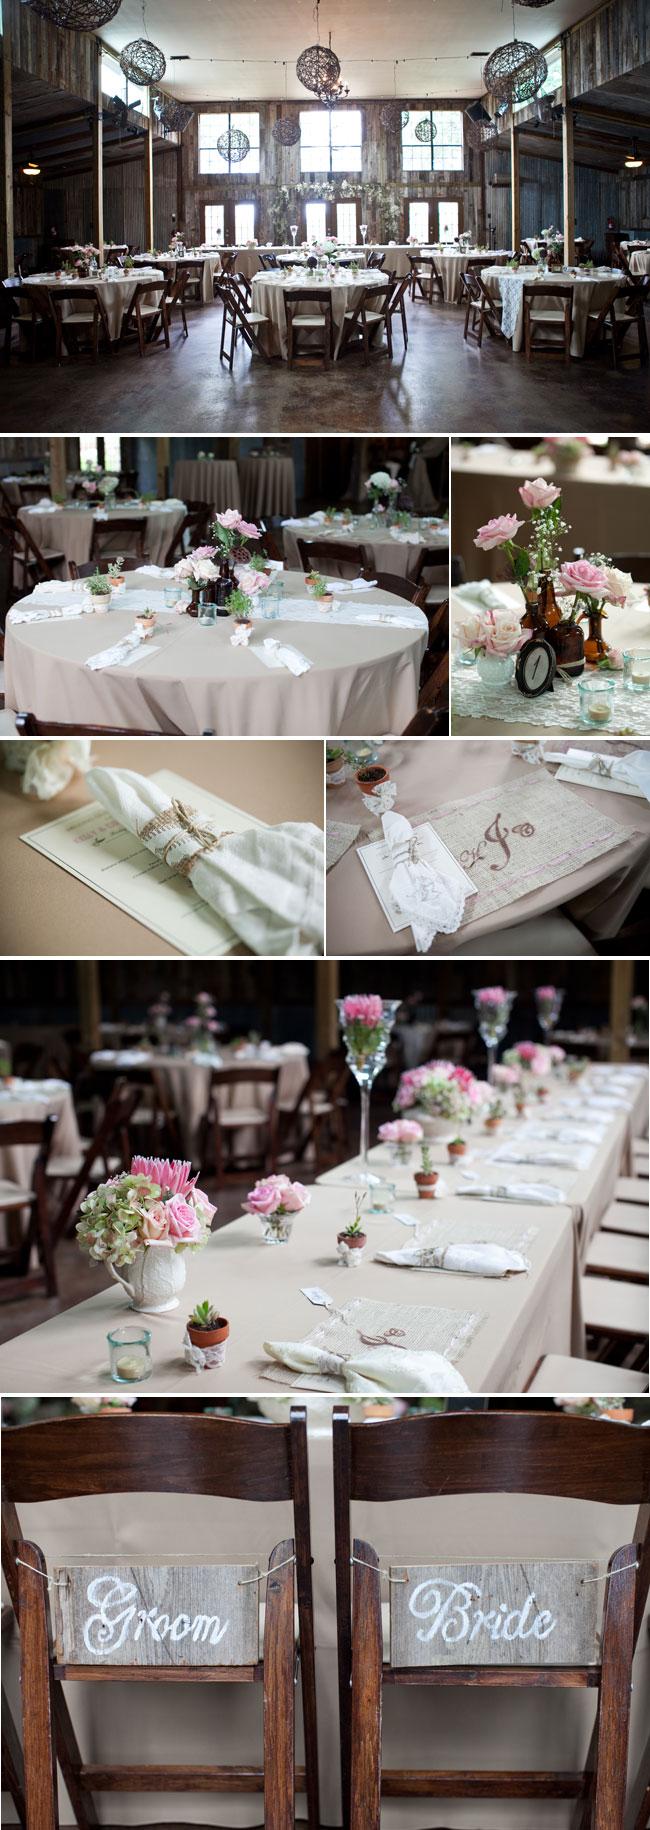 Elegant and Rustic Wedding